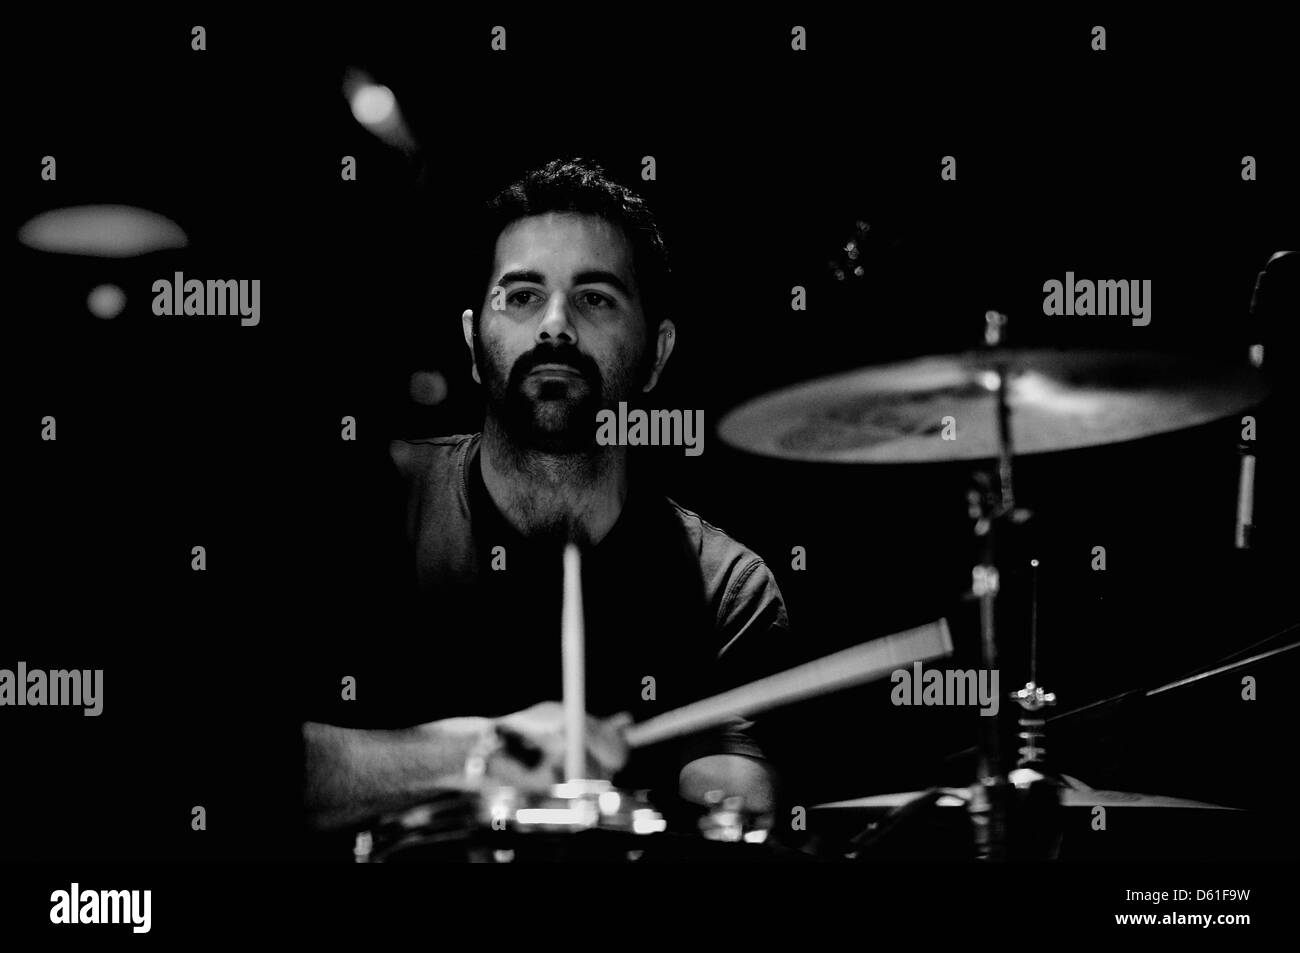 BARCELONA, SPAIN - APR 29: Pony Bravo band drummer performs at KGB on April 29, 2011 in Barcelona, Spain. - Stock Image